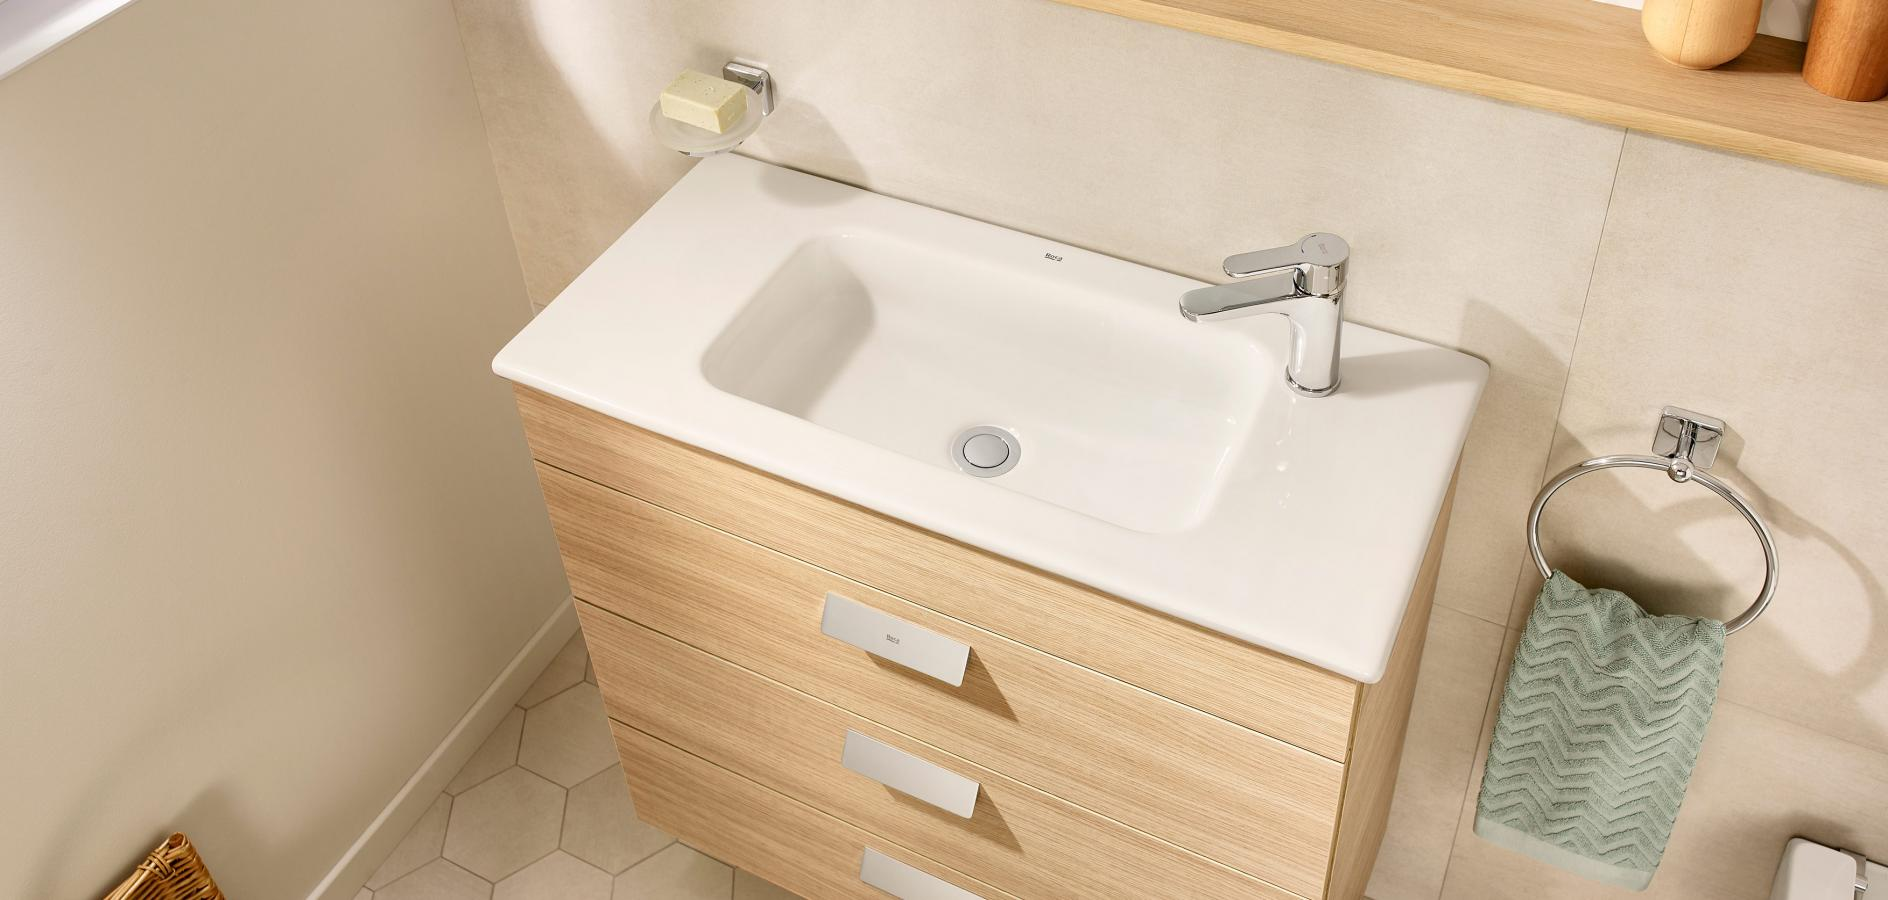 Enjoyable Compact Bathroom Units And Small Bathroom Cabinets Roca Life Interior Design Ideas Jittwwsoteloinfo